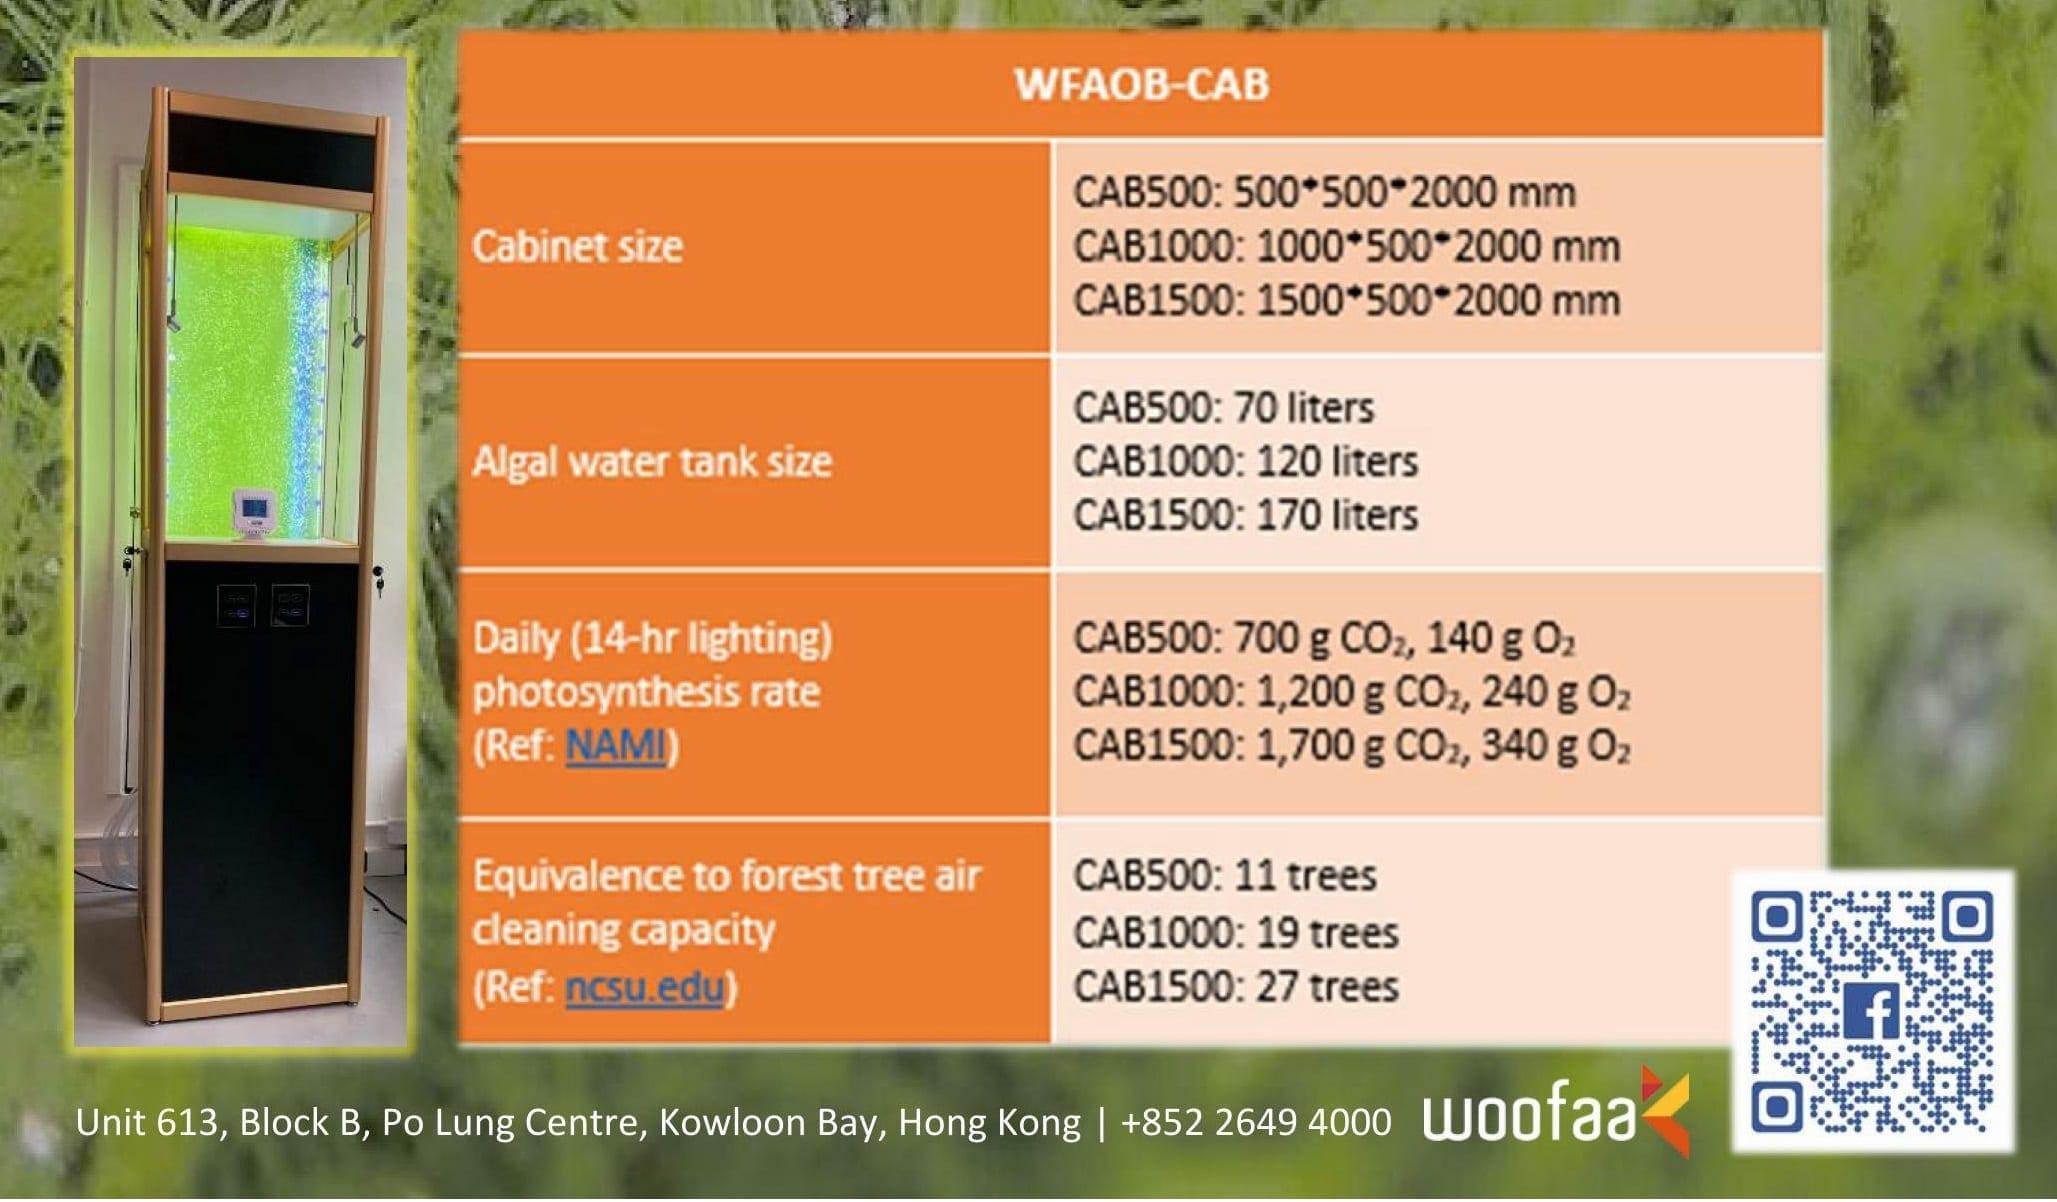 WOOFAA Algal Photosynthetic Smart IoT+IAQ Appliance